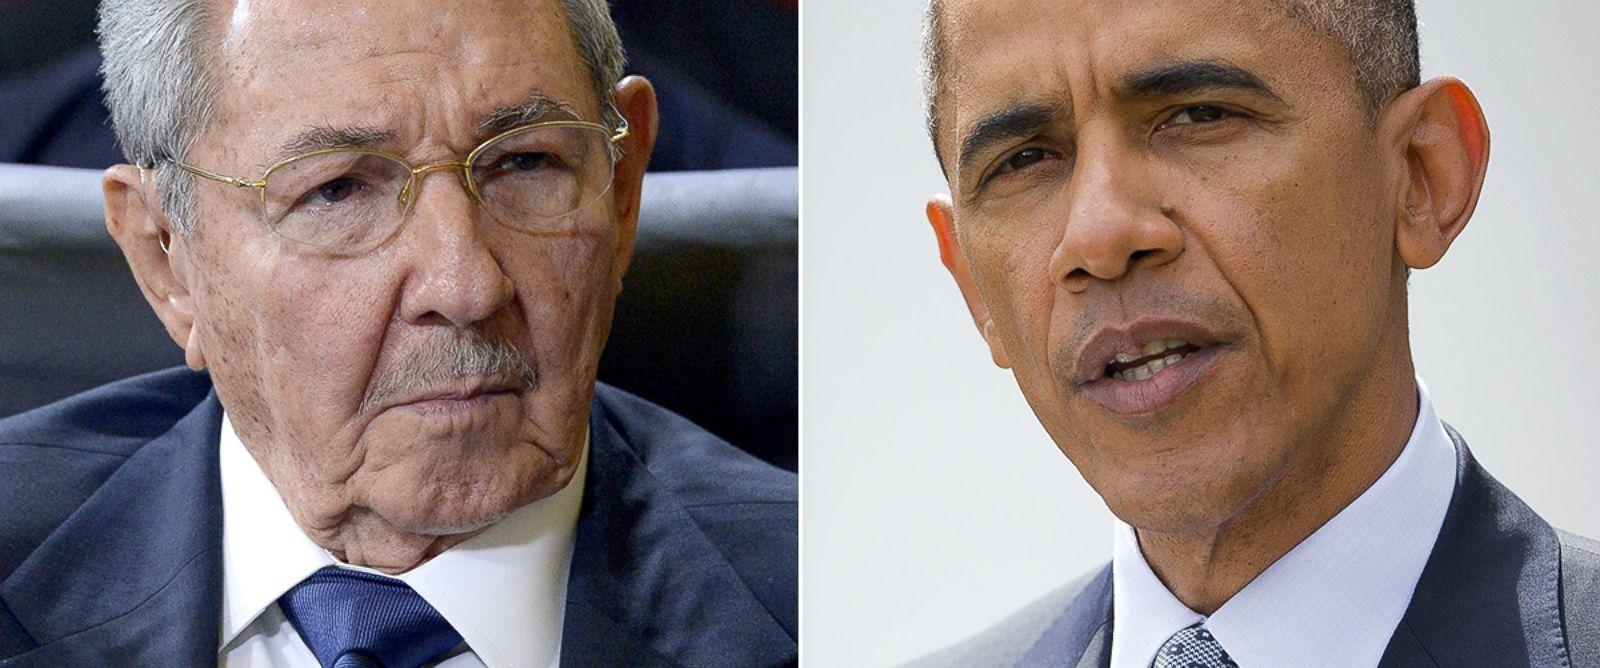 PHOTO: Raul Castro, left, and Barack Obama.